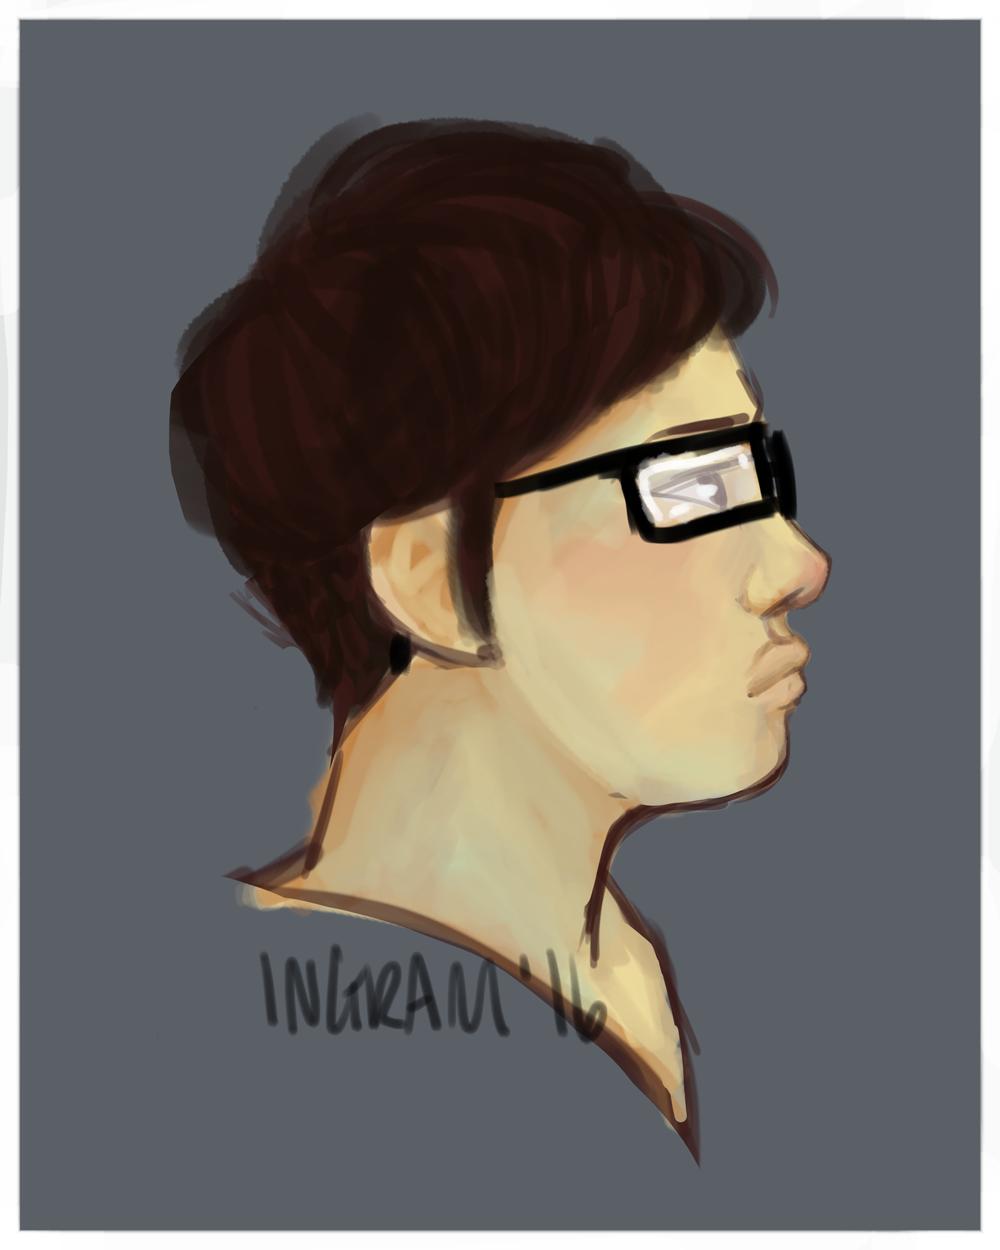 Self-face by Amyln